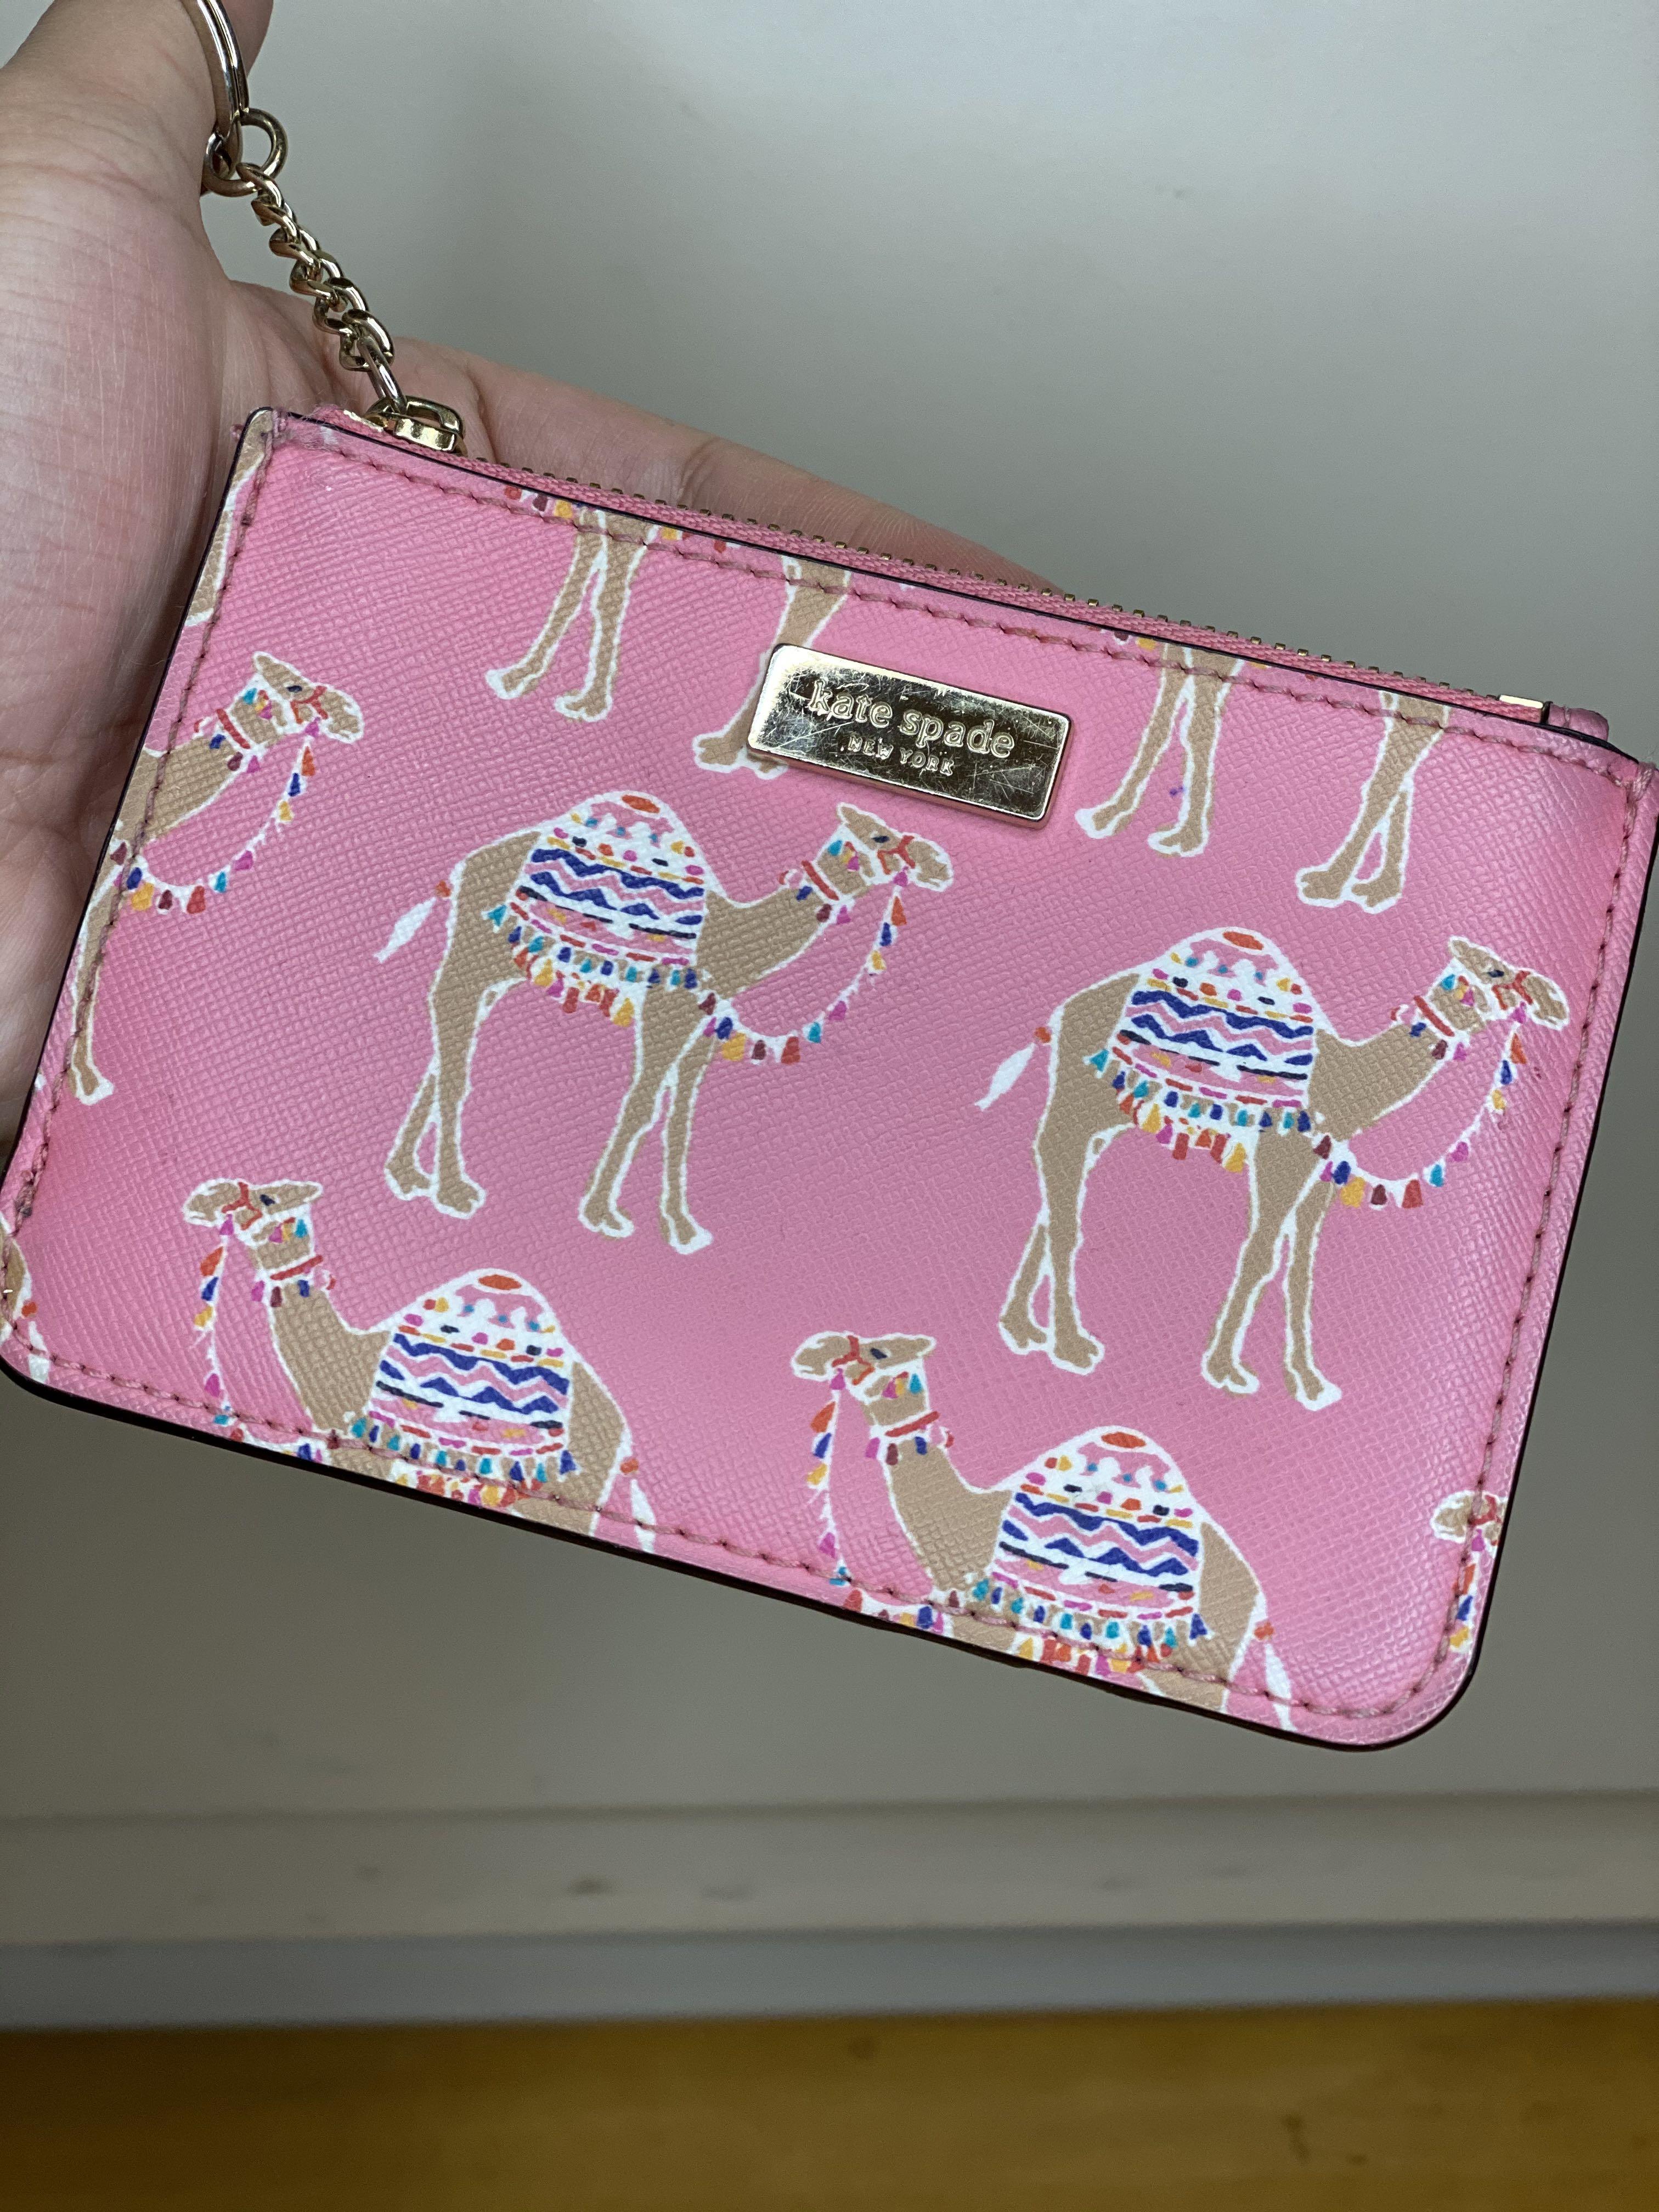 Kate Spade Card Holder Keychain - Pink Camel Print